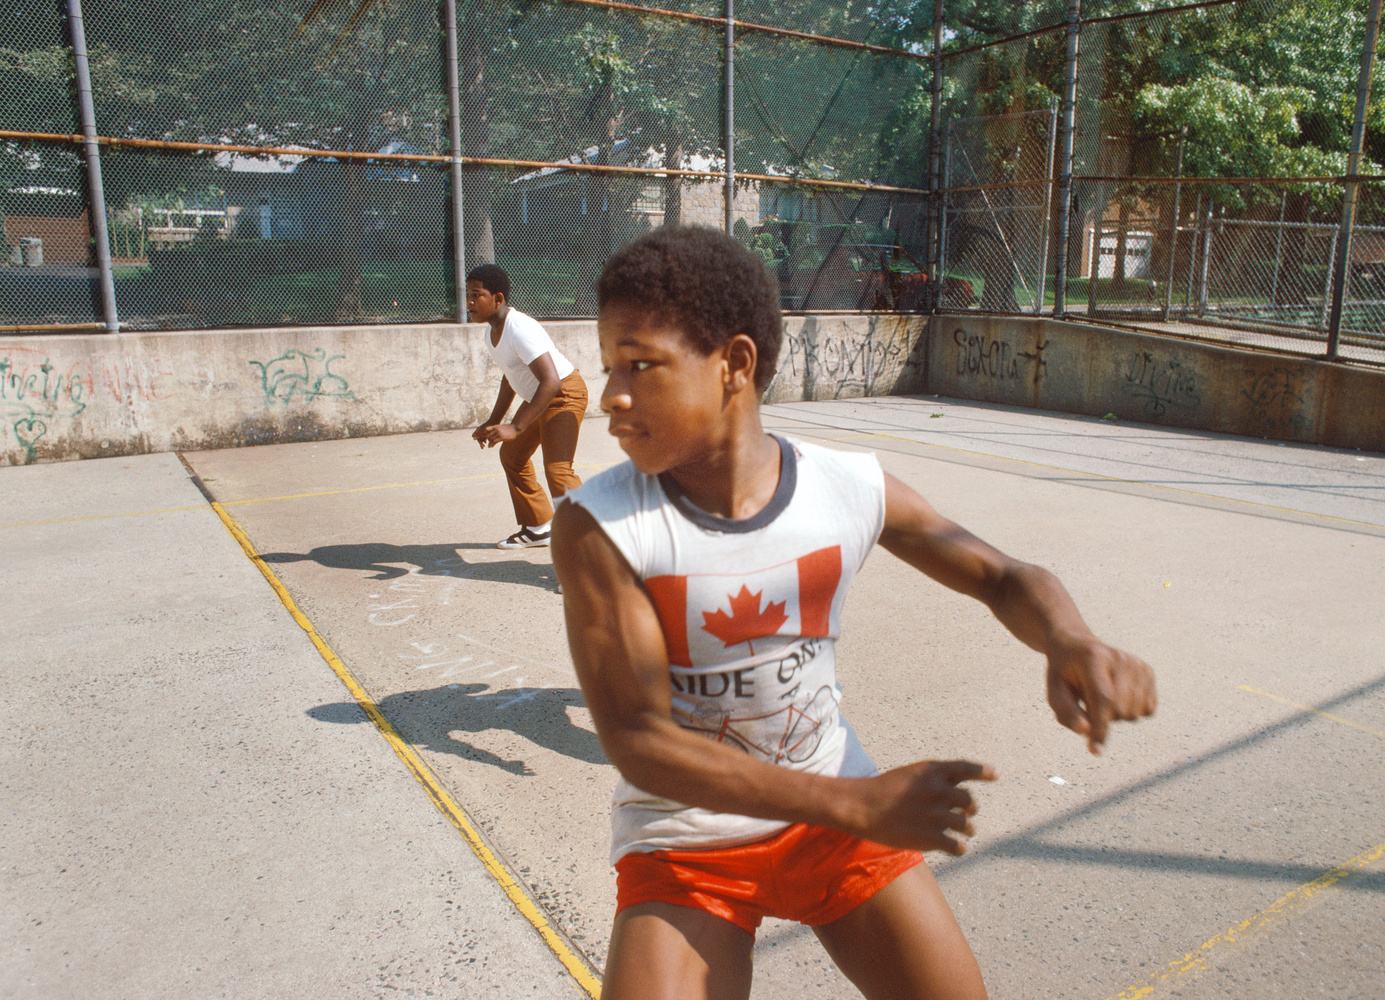 Paul Hosefros basketballl kid